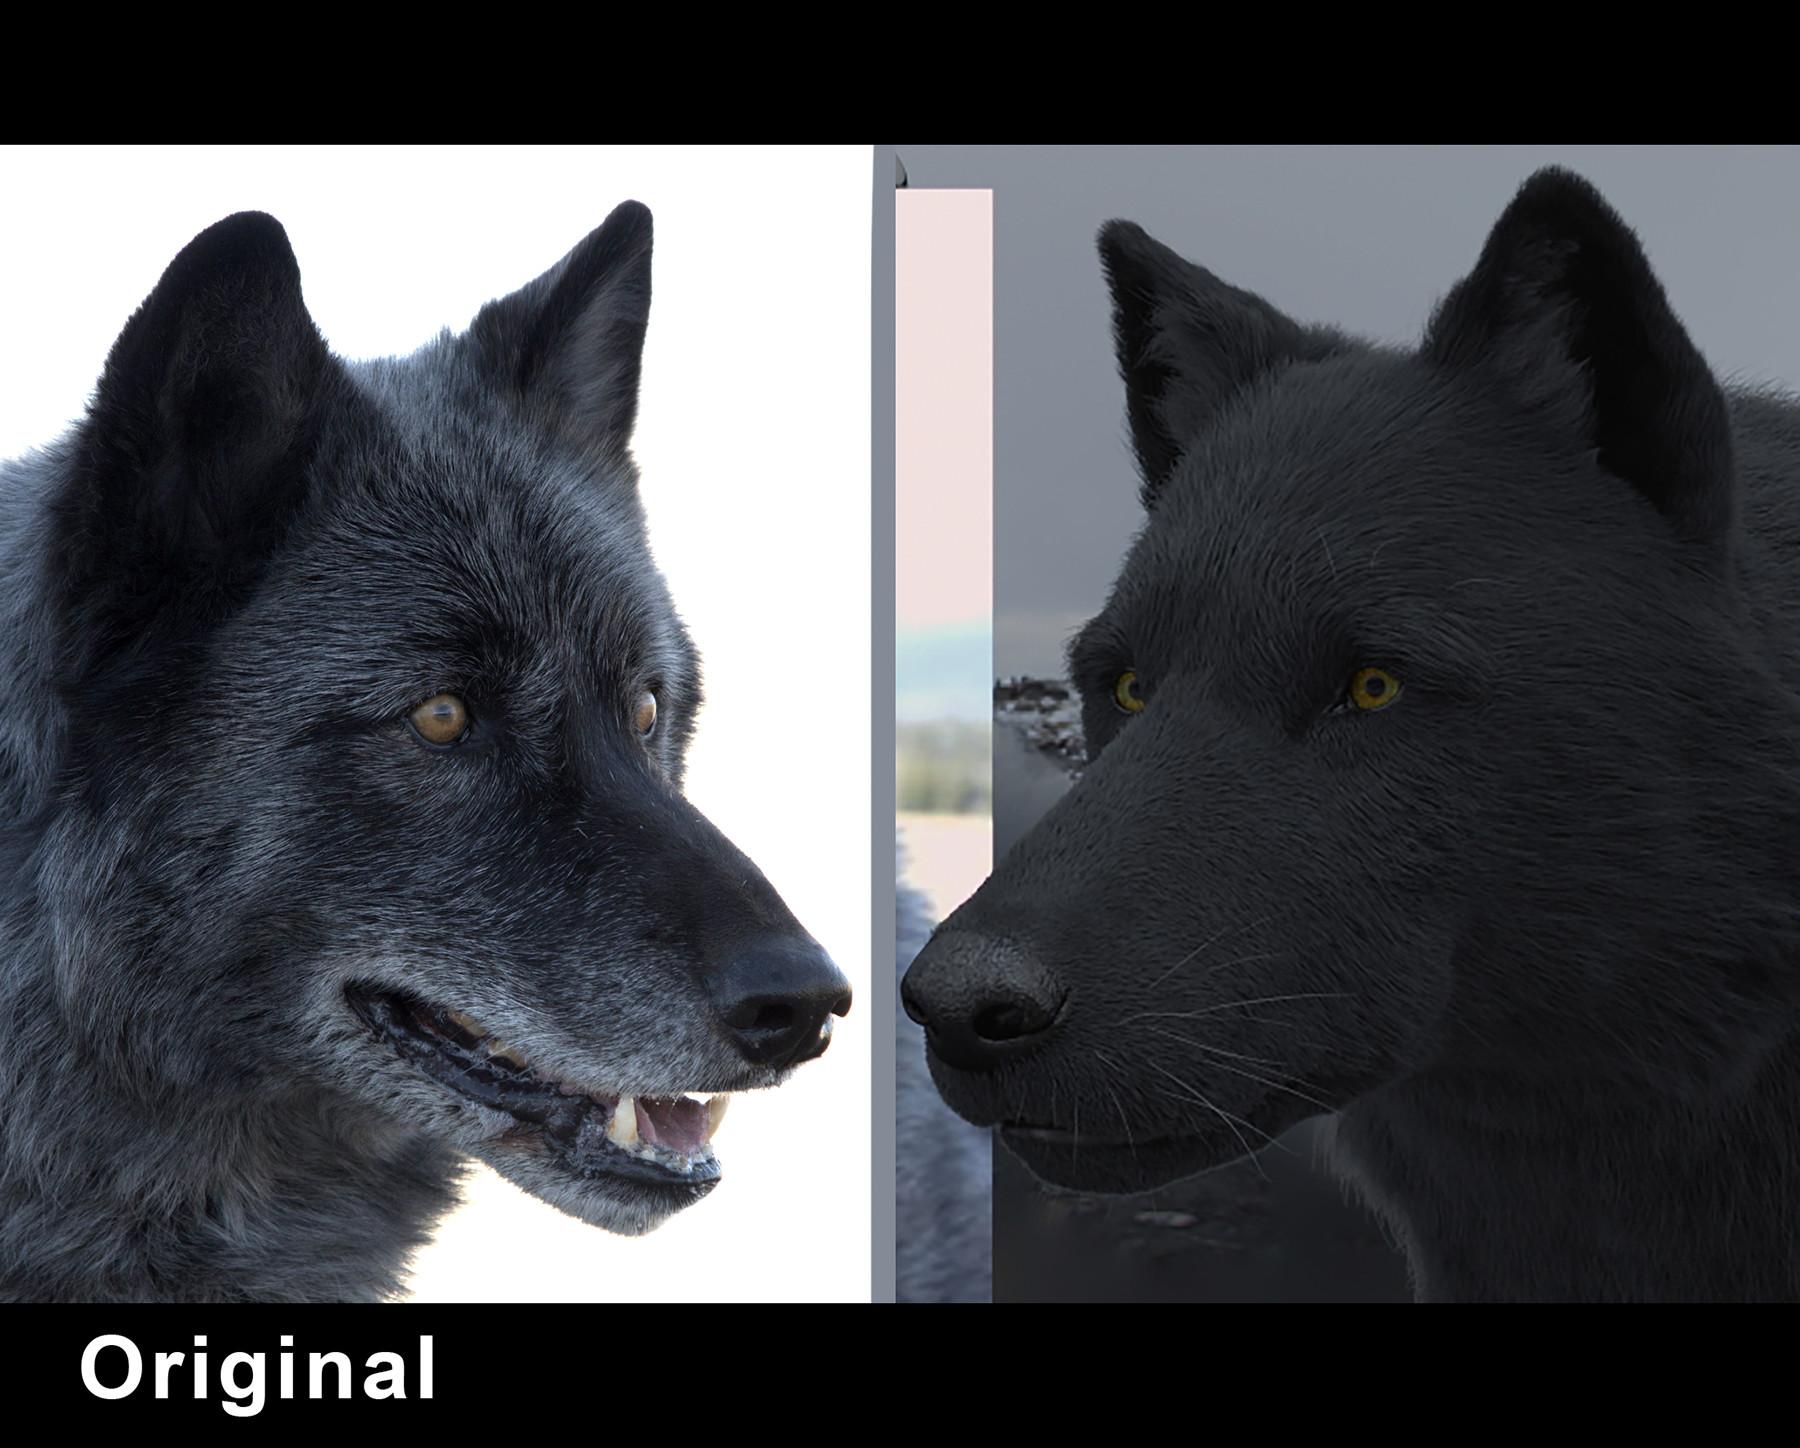 Luis carrasco wolf fur original